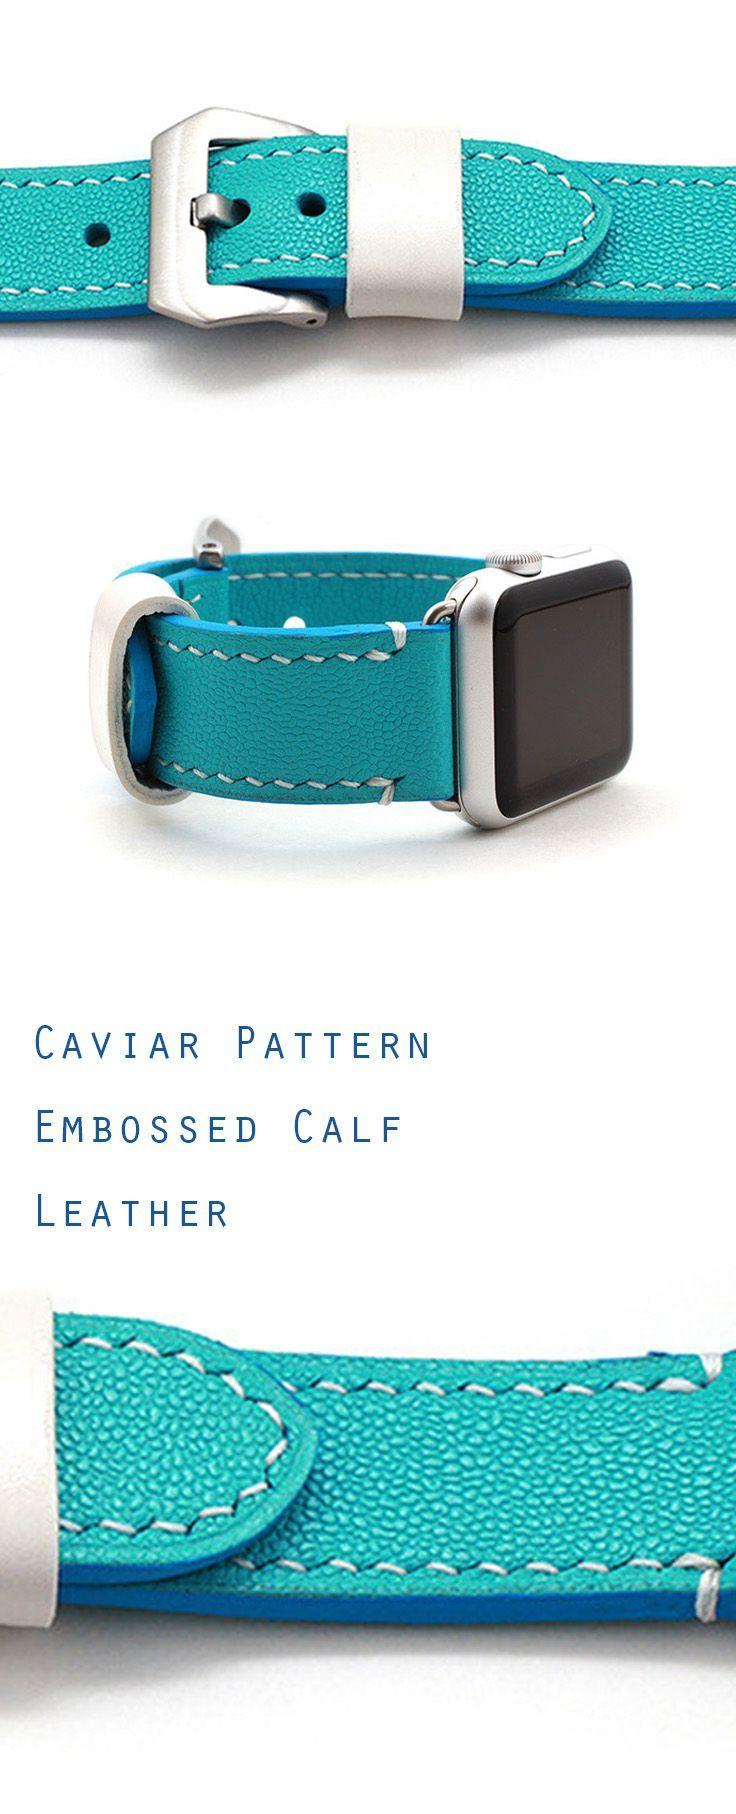 Apple Watch strap band in Caviar Pattern Embossed calf AQUA BLUE (turquoise) leather (scheduled via http://www.tailwindapp.com?utm_source=pinterest&utm_medium=twpin)